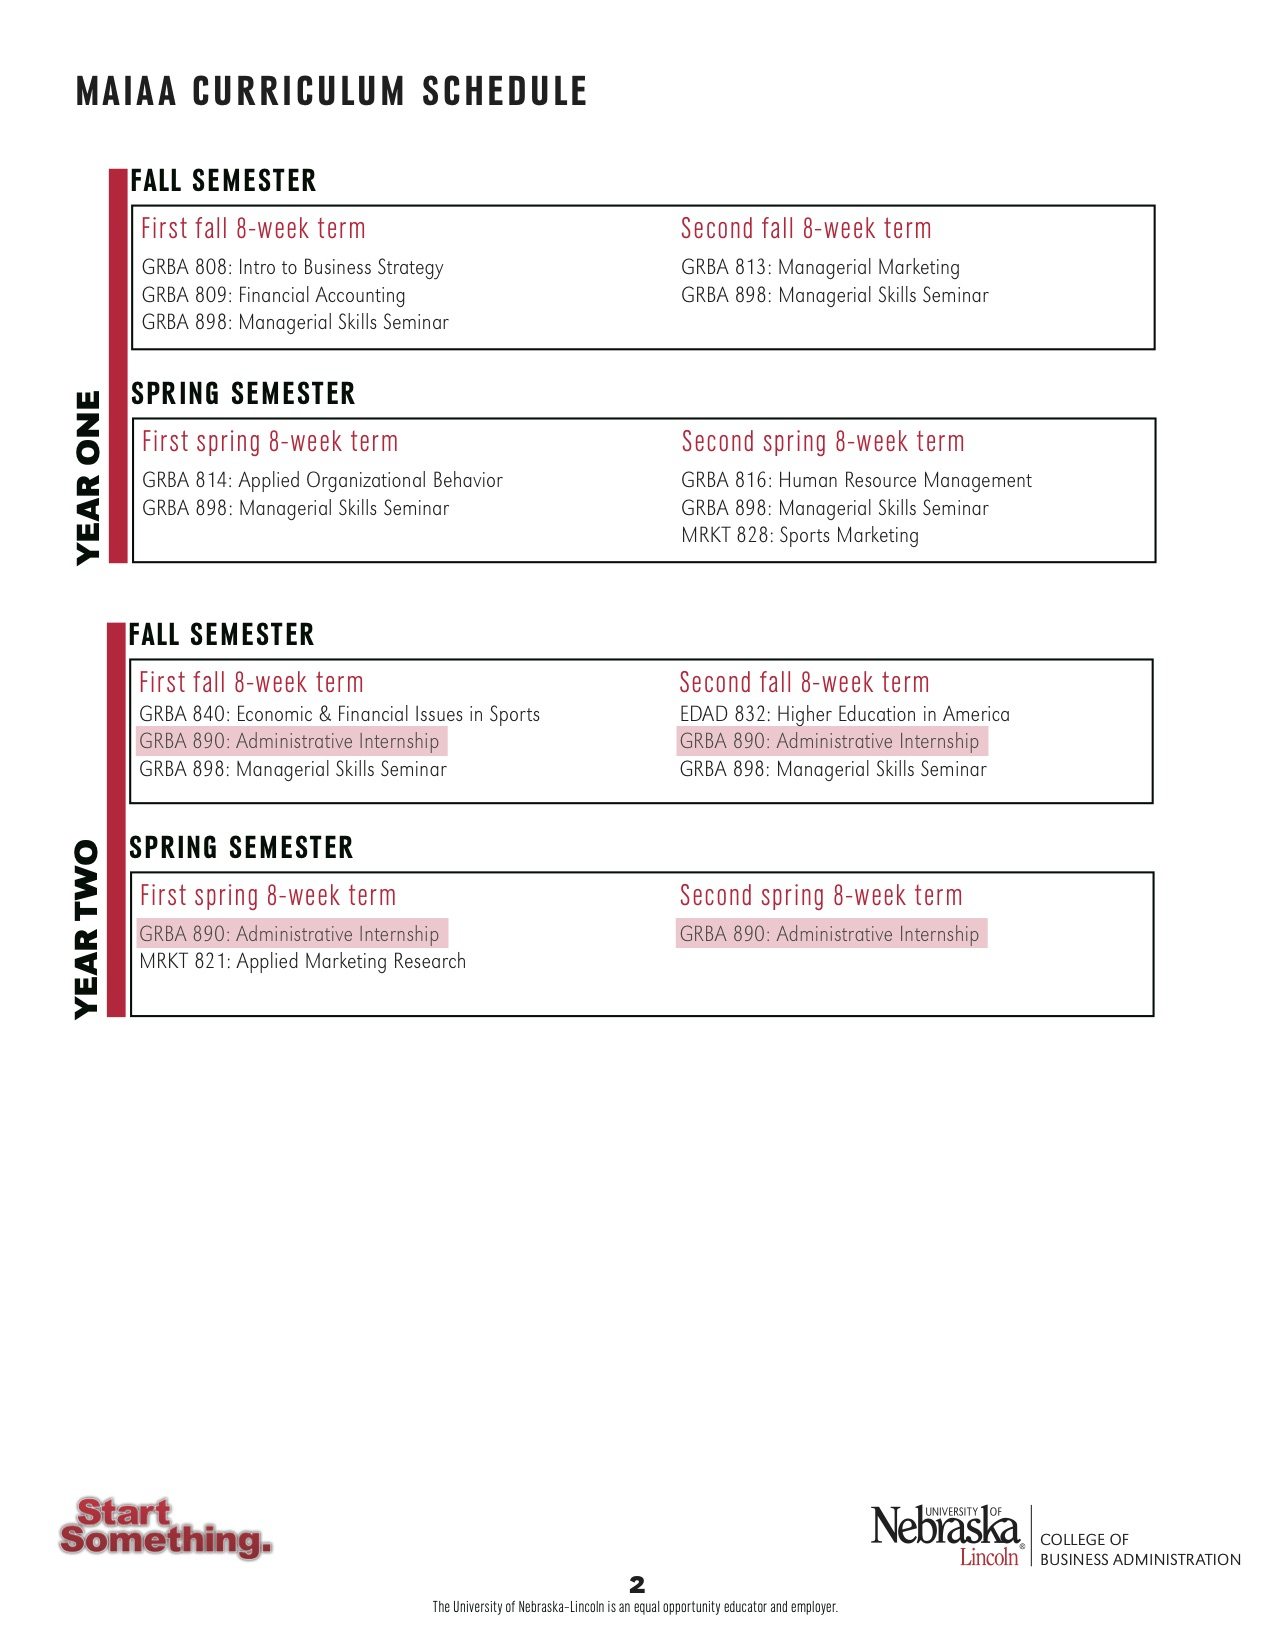 MAIAA Curriculum Guide